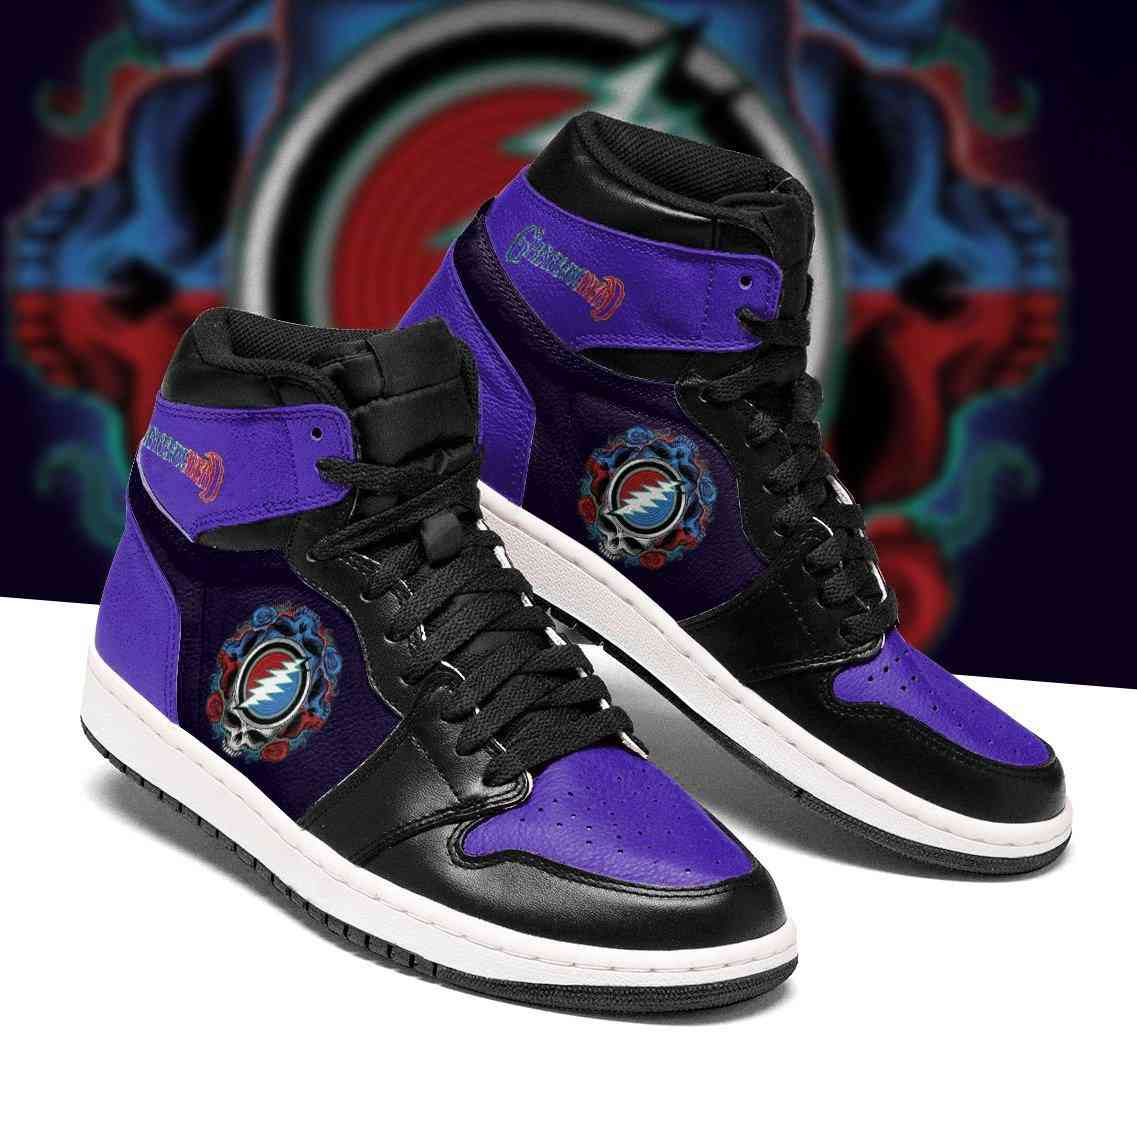 Grateful Dead Custom Air Jordan Shoes